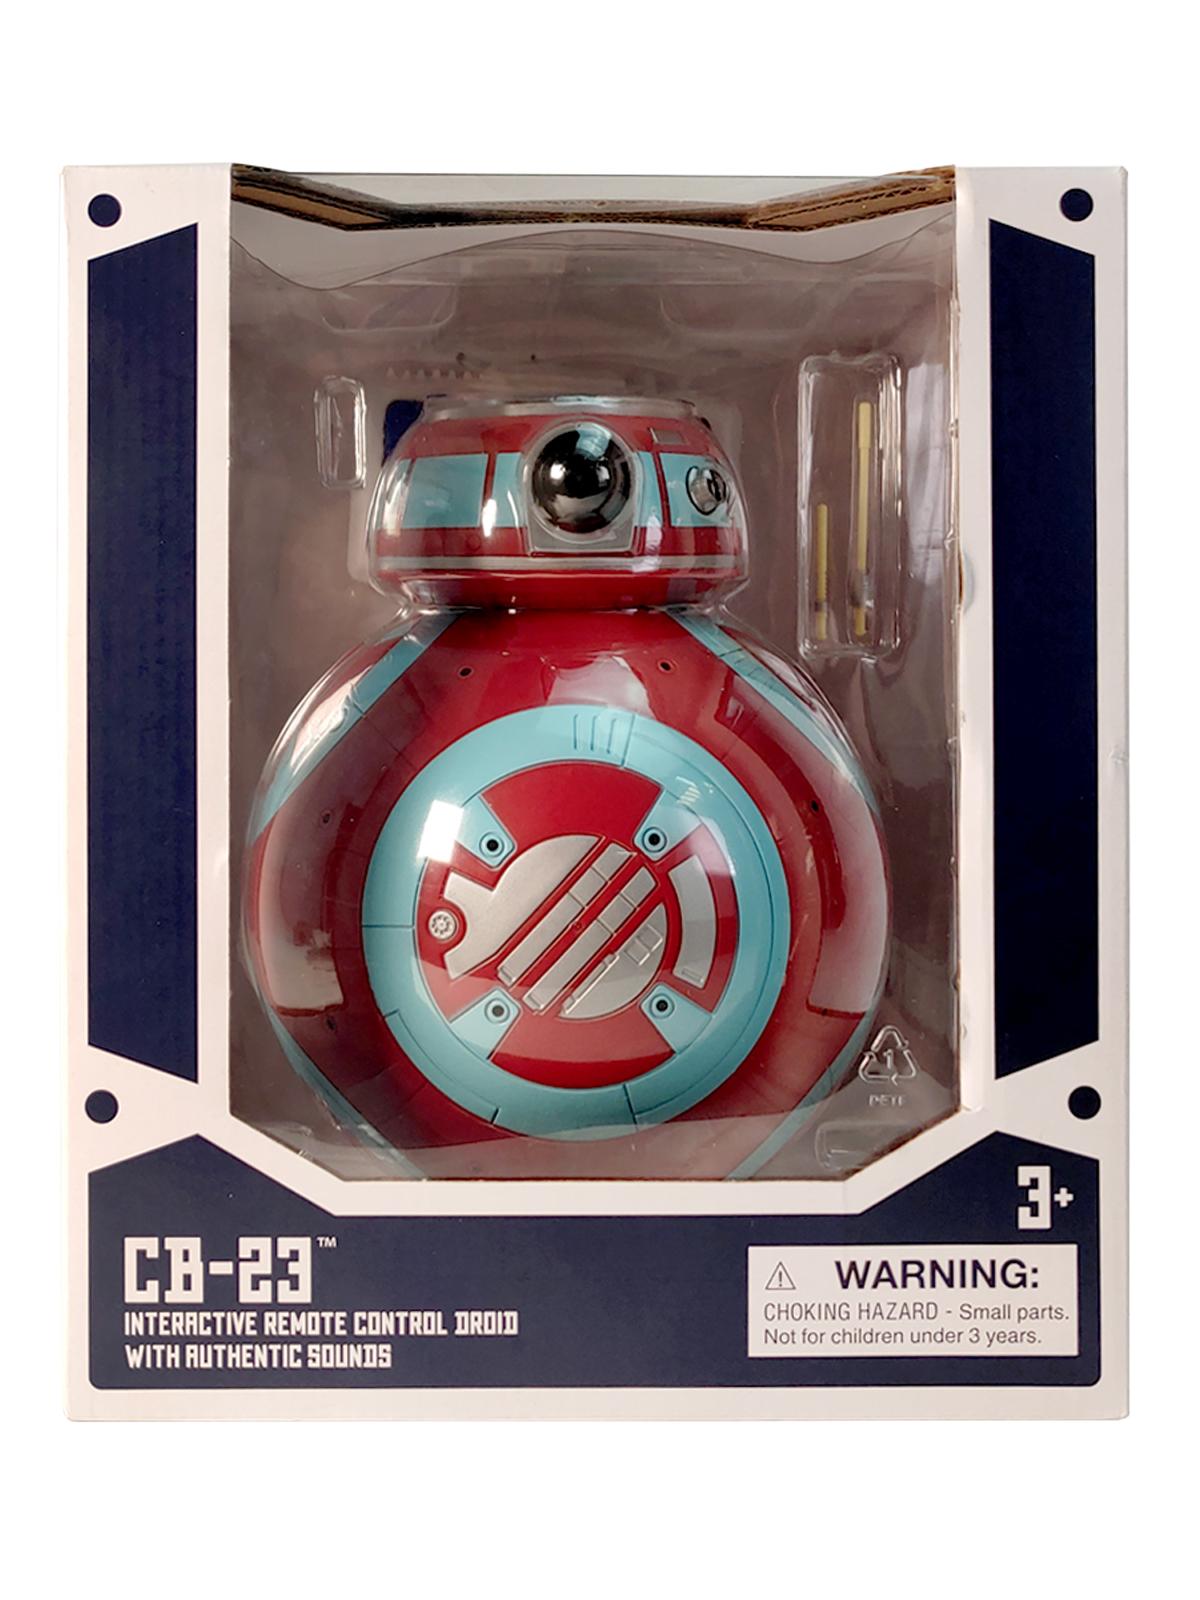 SWGE CB-23 Interactive Remote Control Droid Toy 1